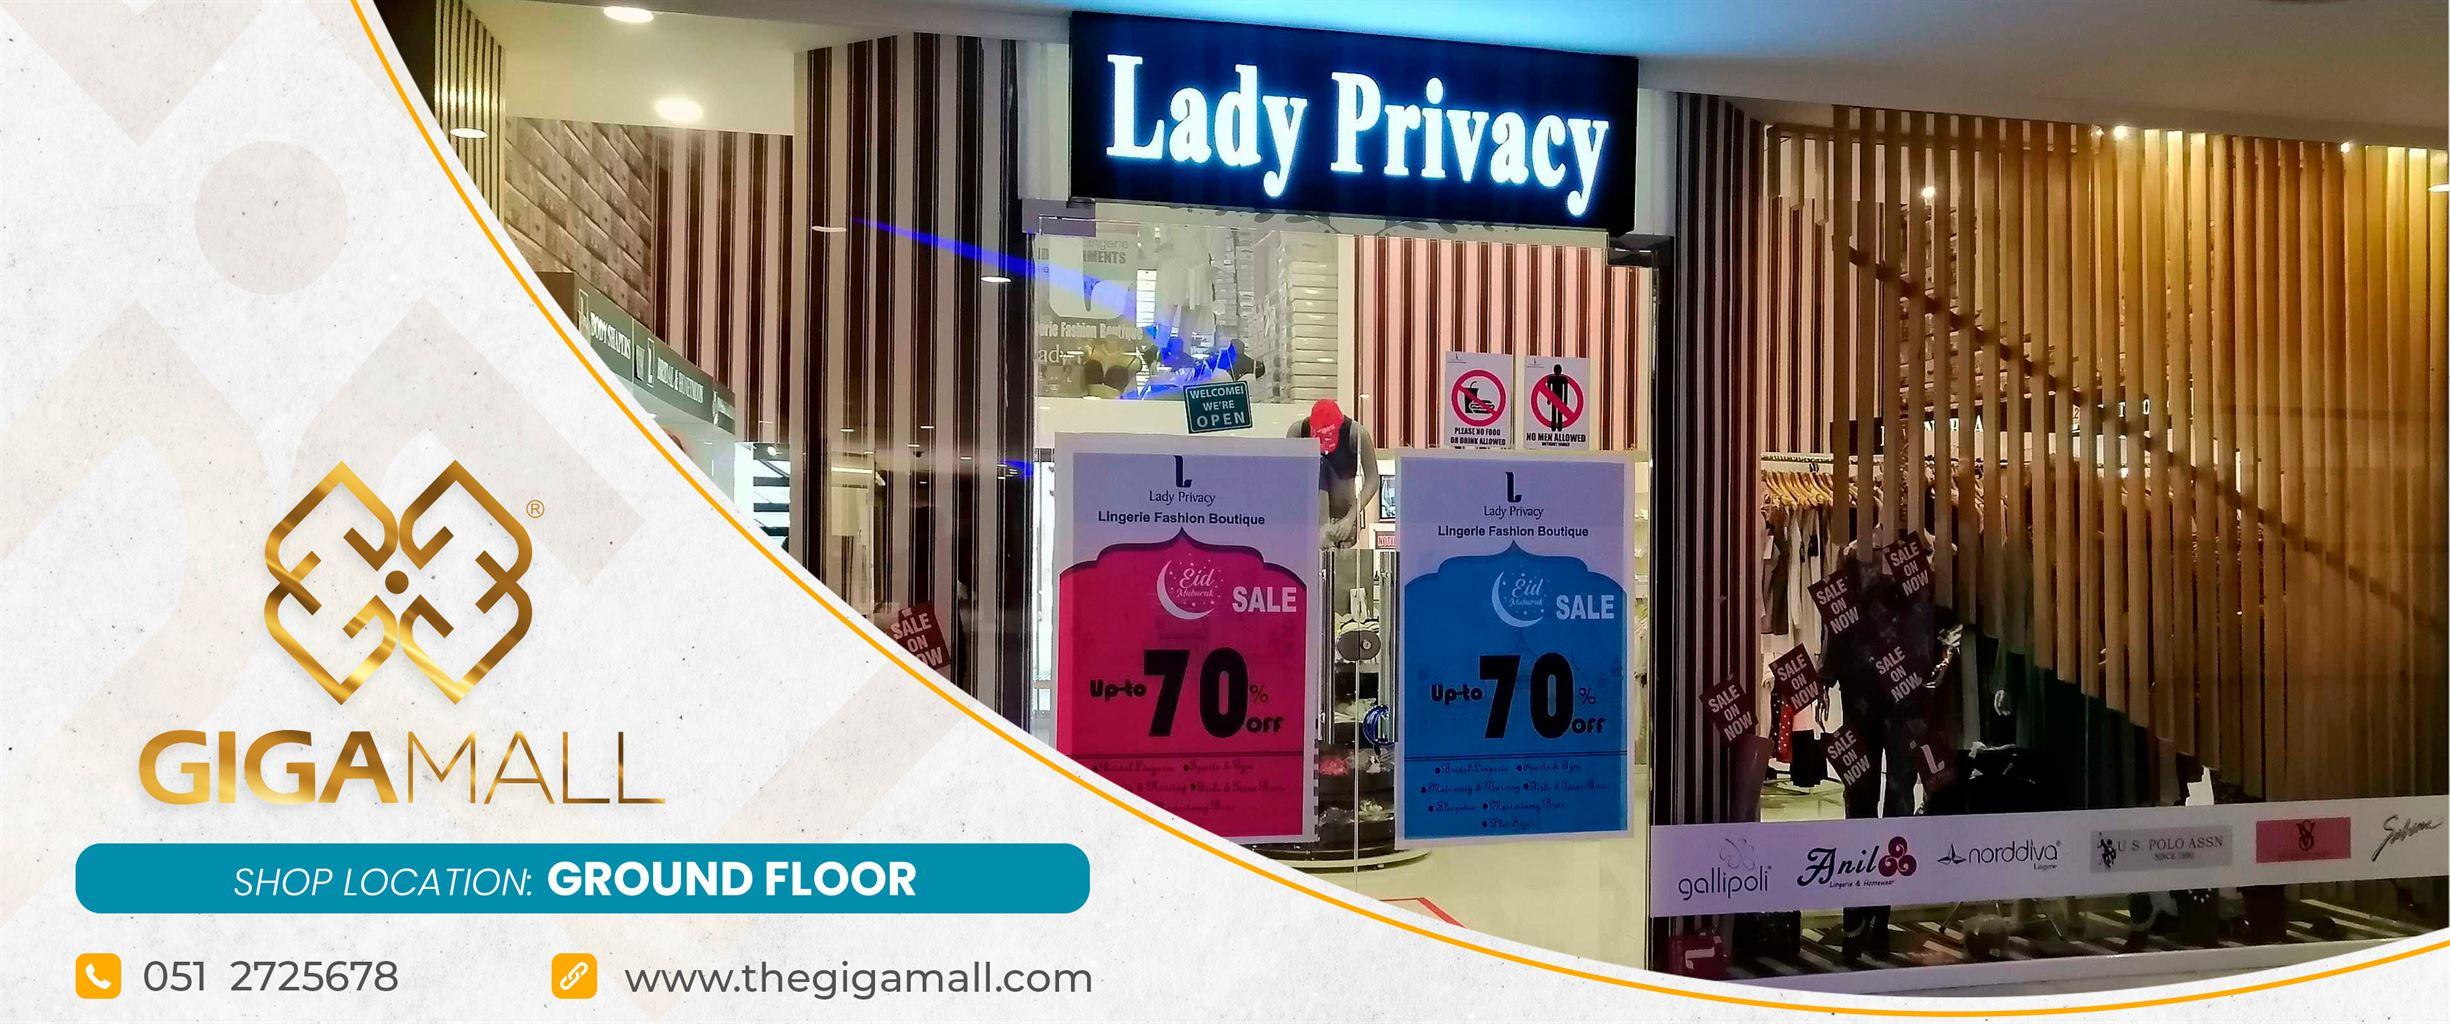 Lady Privacy